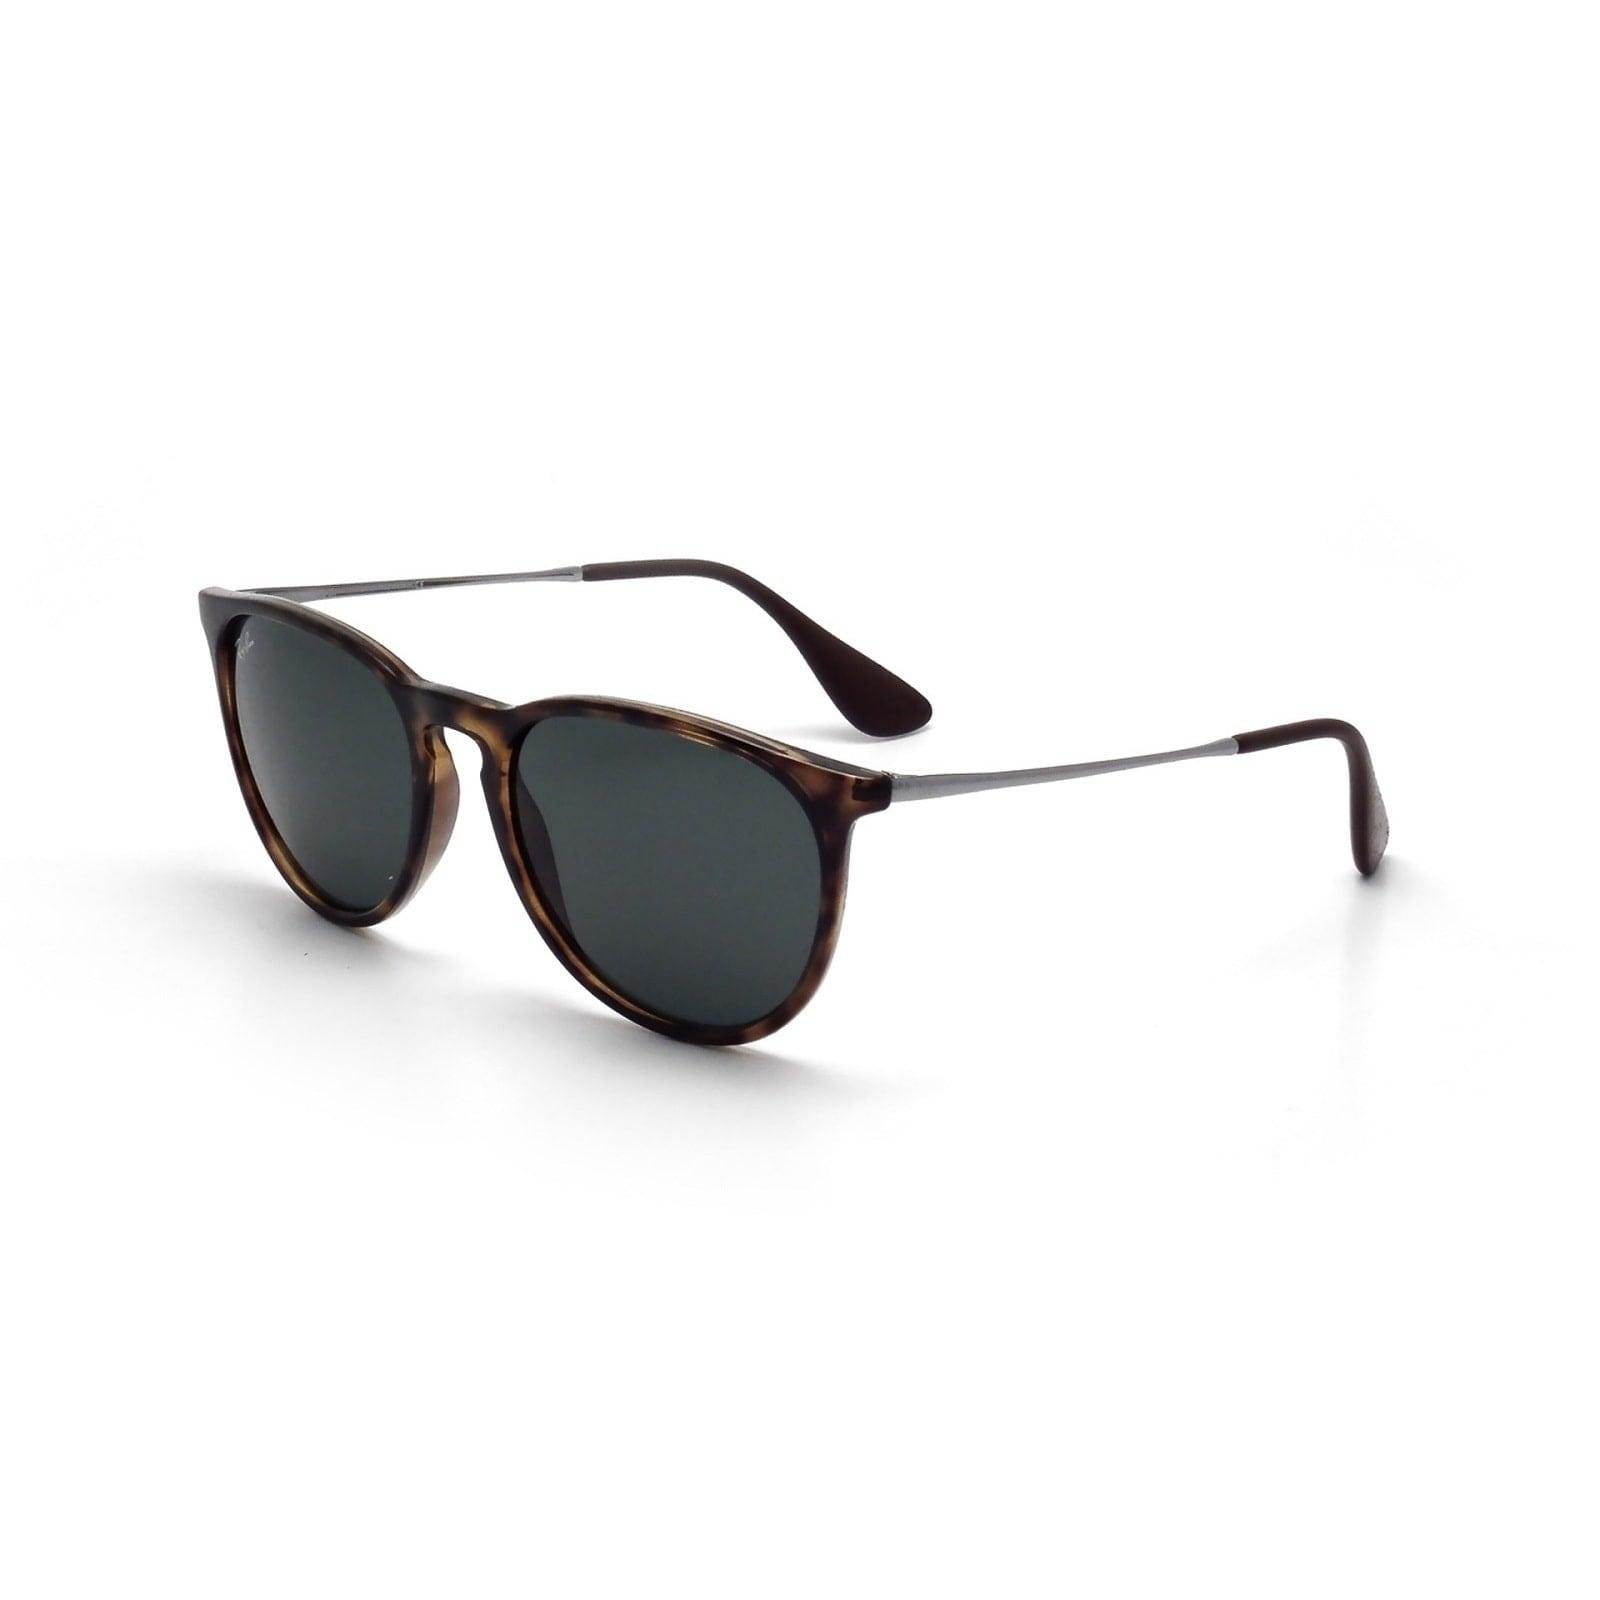 e4a7f0a4a Ray-Ban RB4171 Erica Classic Women Polarized Sunglasses 710/T5 Sunglasses & Eyewear  Accessories